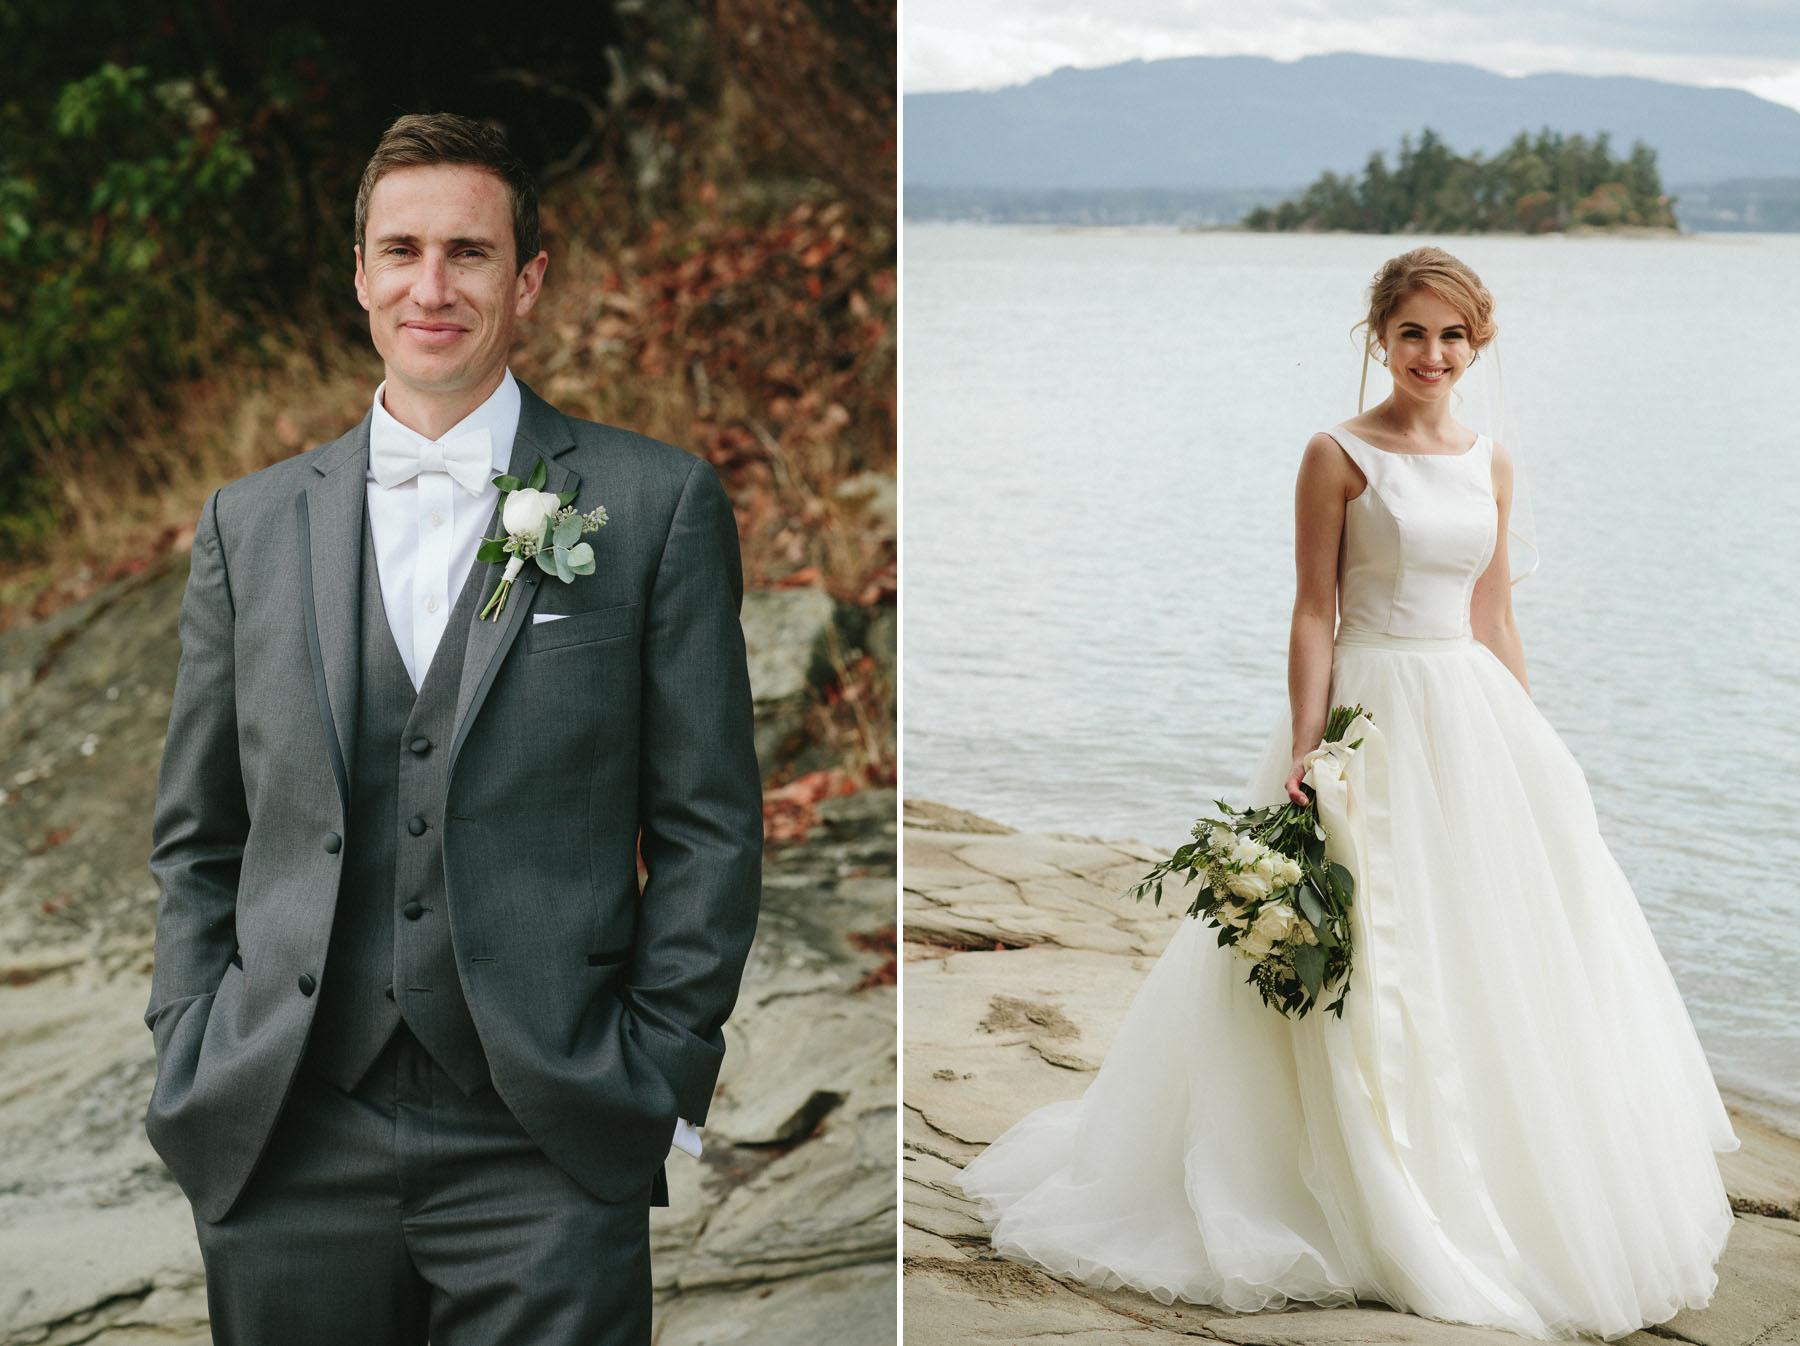 thetis-island-wedding-photographer-rp-rn-115.jpg